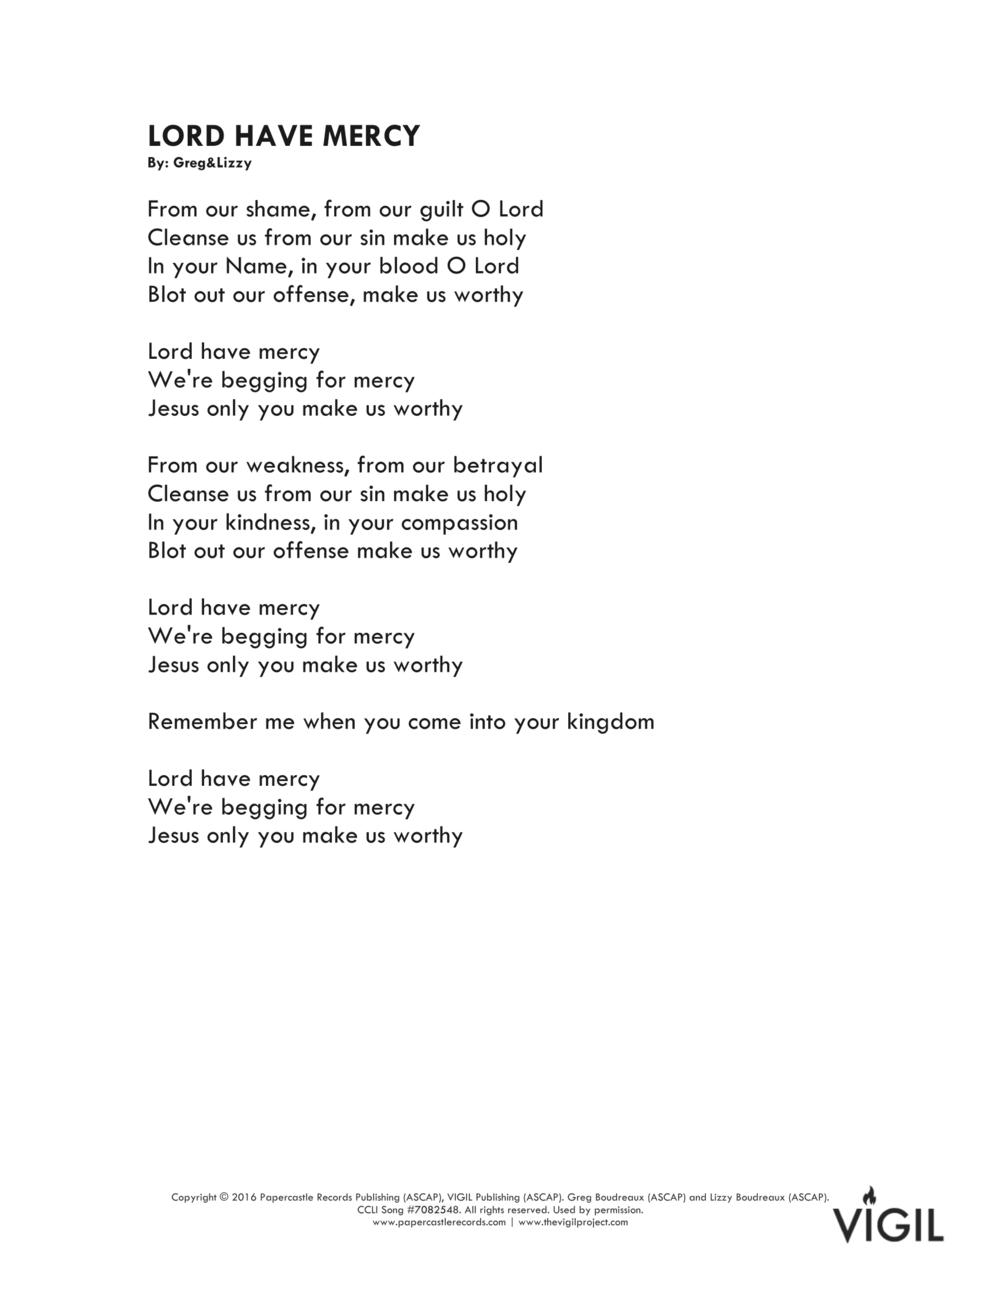 VIGIL S1 - Lord Have Mercy (Lyrics)-1.png